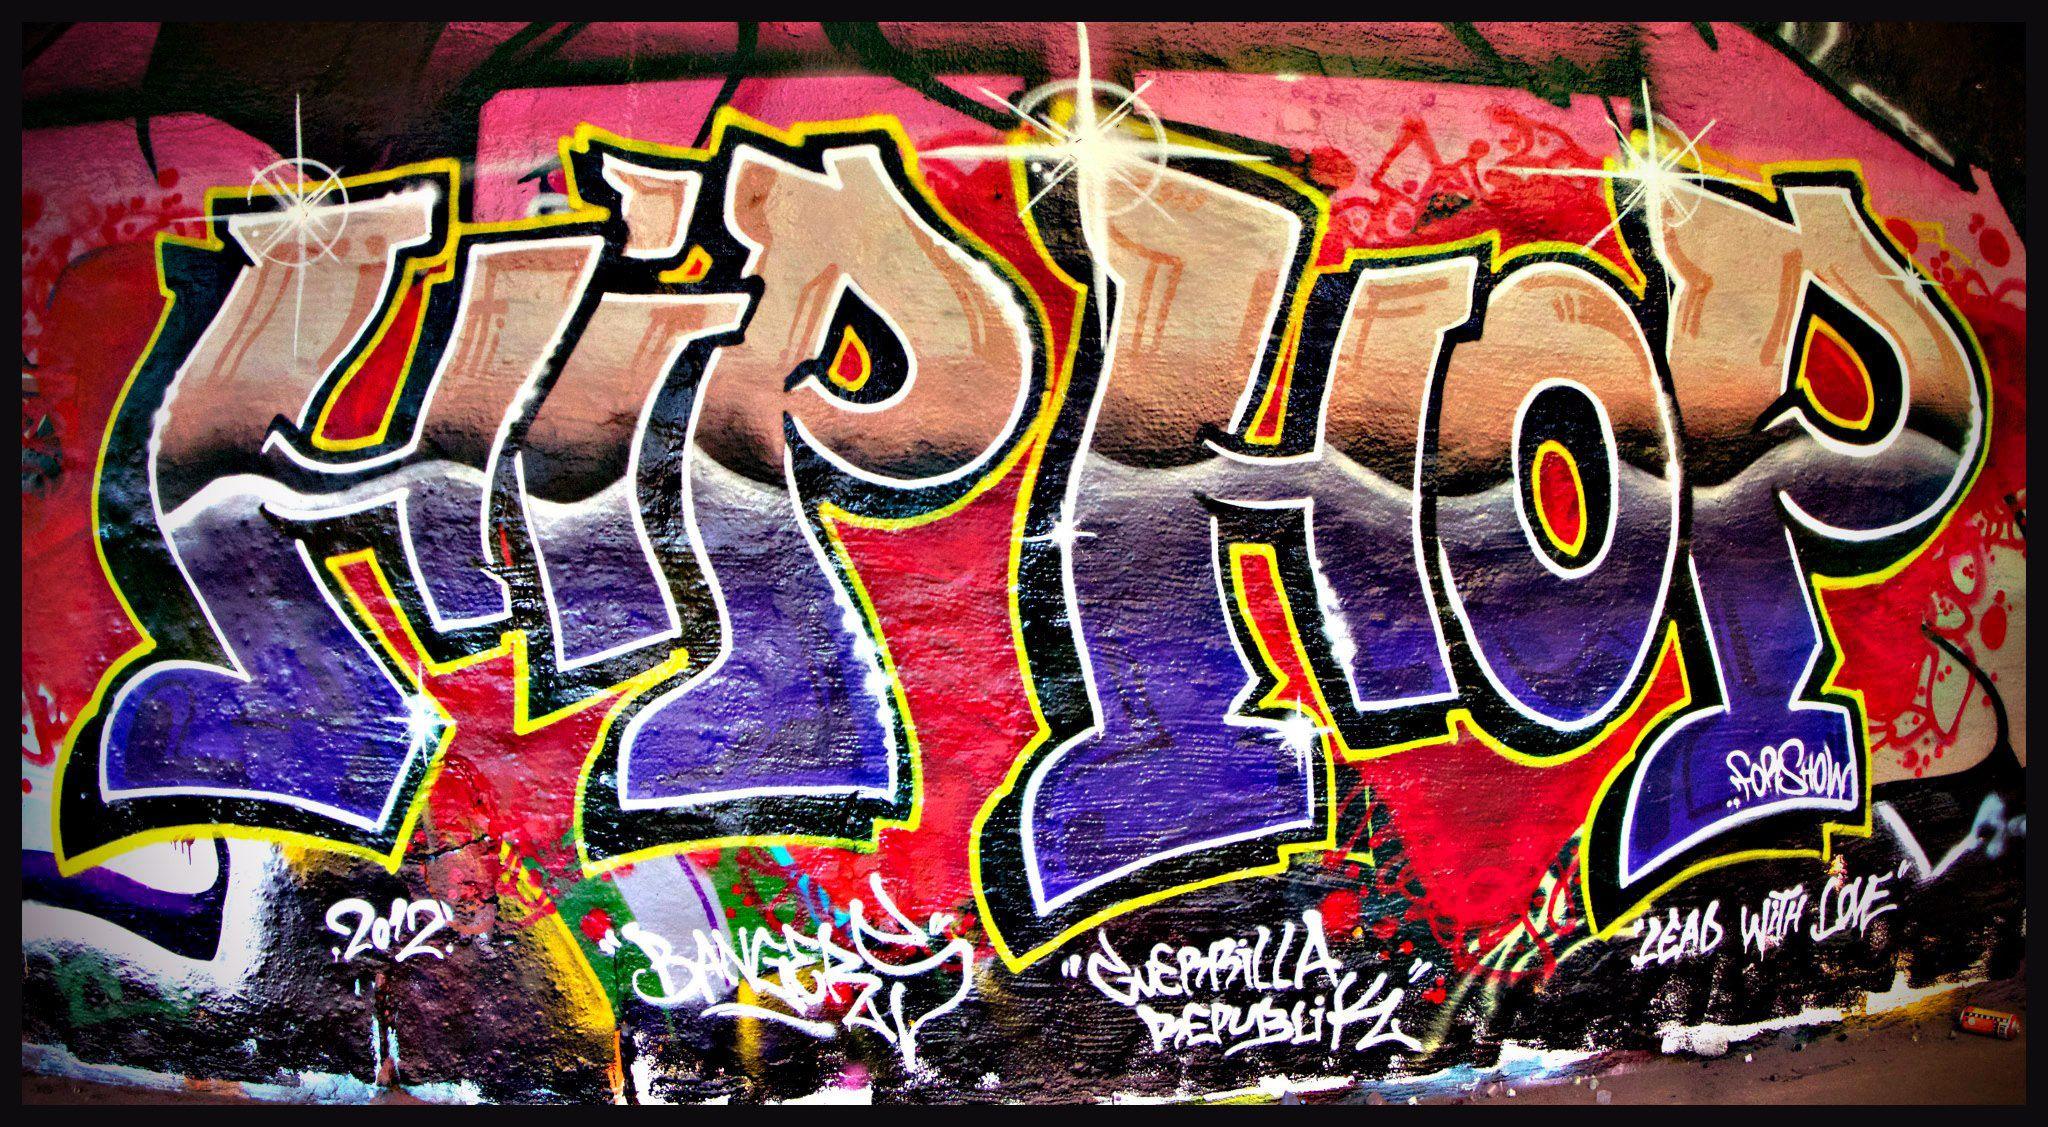 Graffiti wall activity - Graffiti Hip Hop Team Building Barcelona